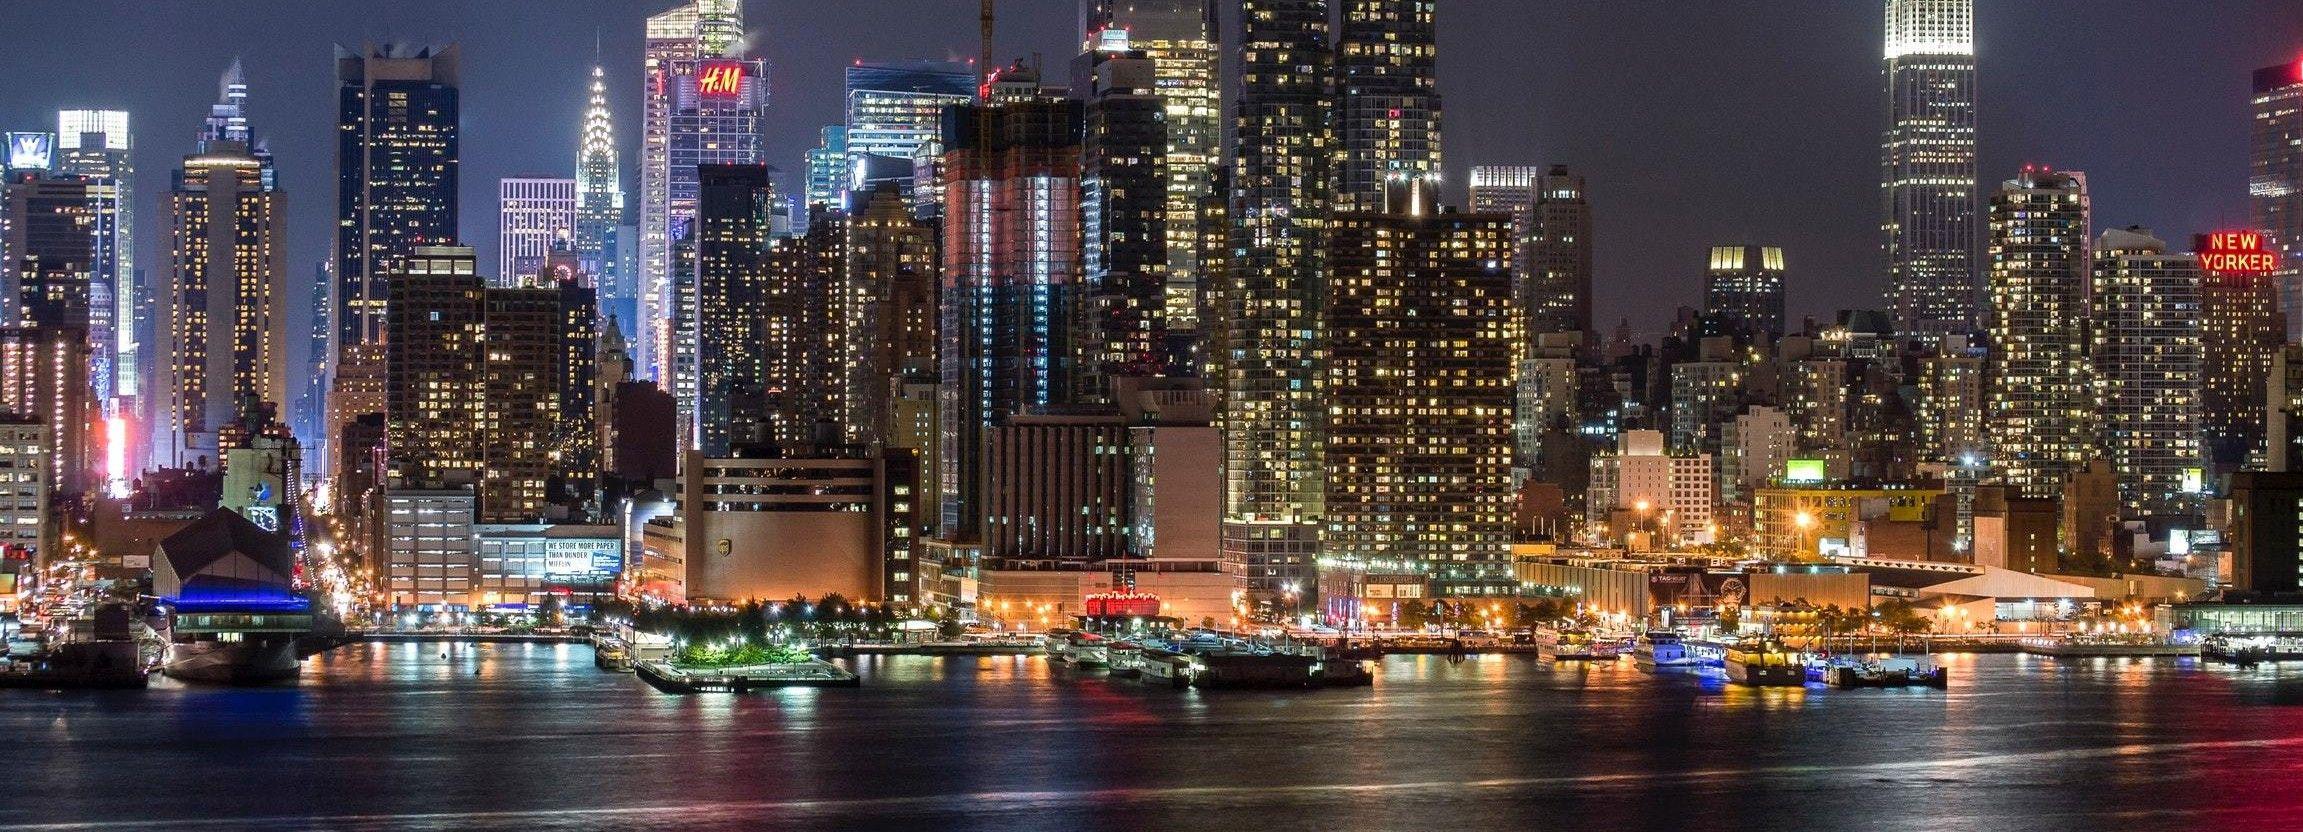 New York City: Skyline at Night Tour